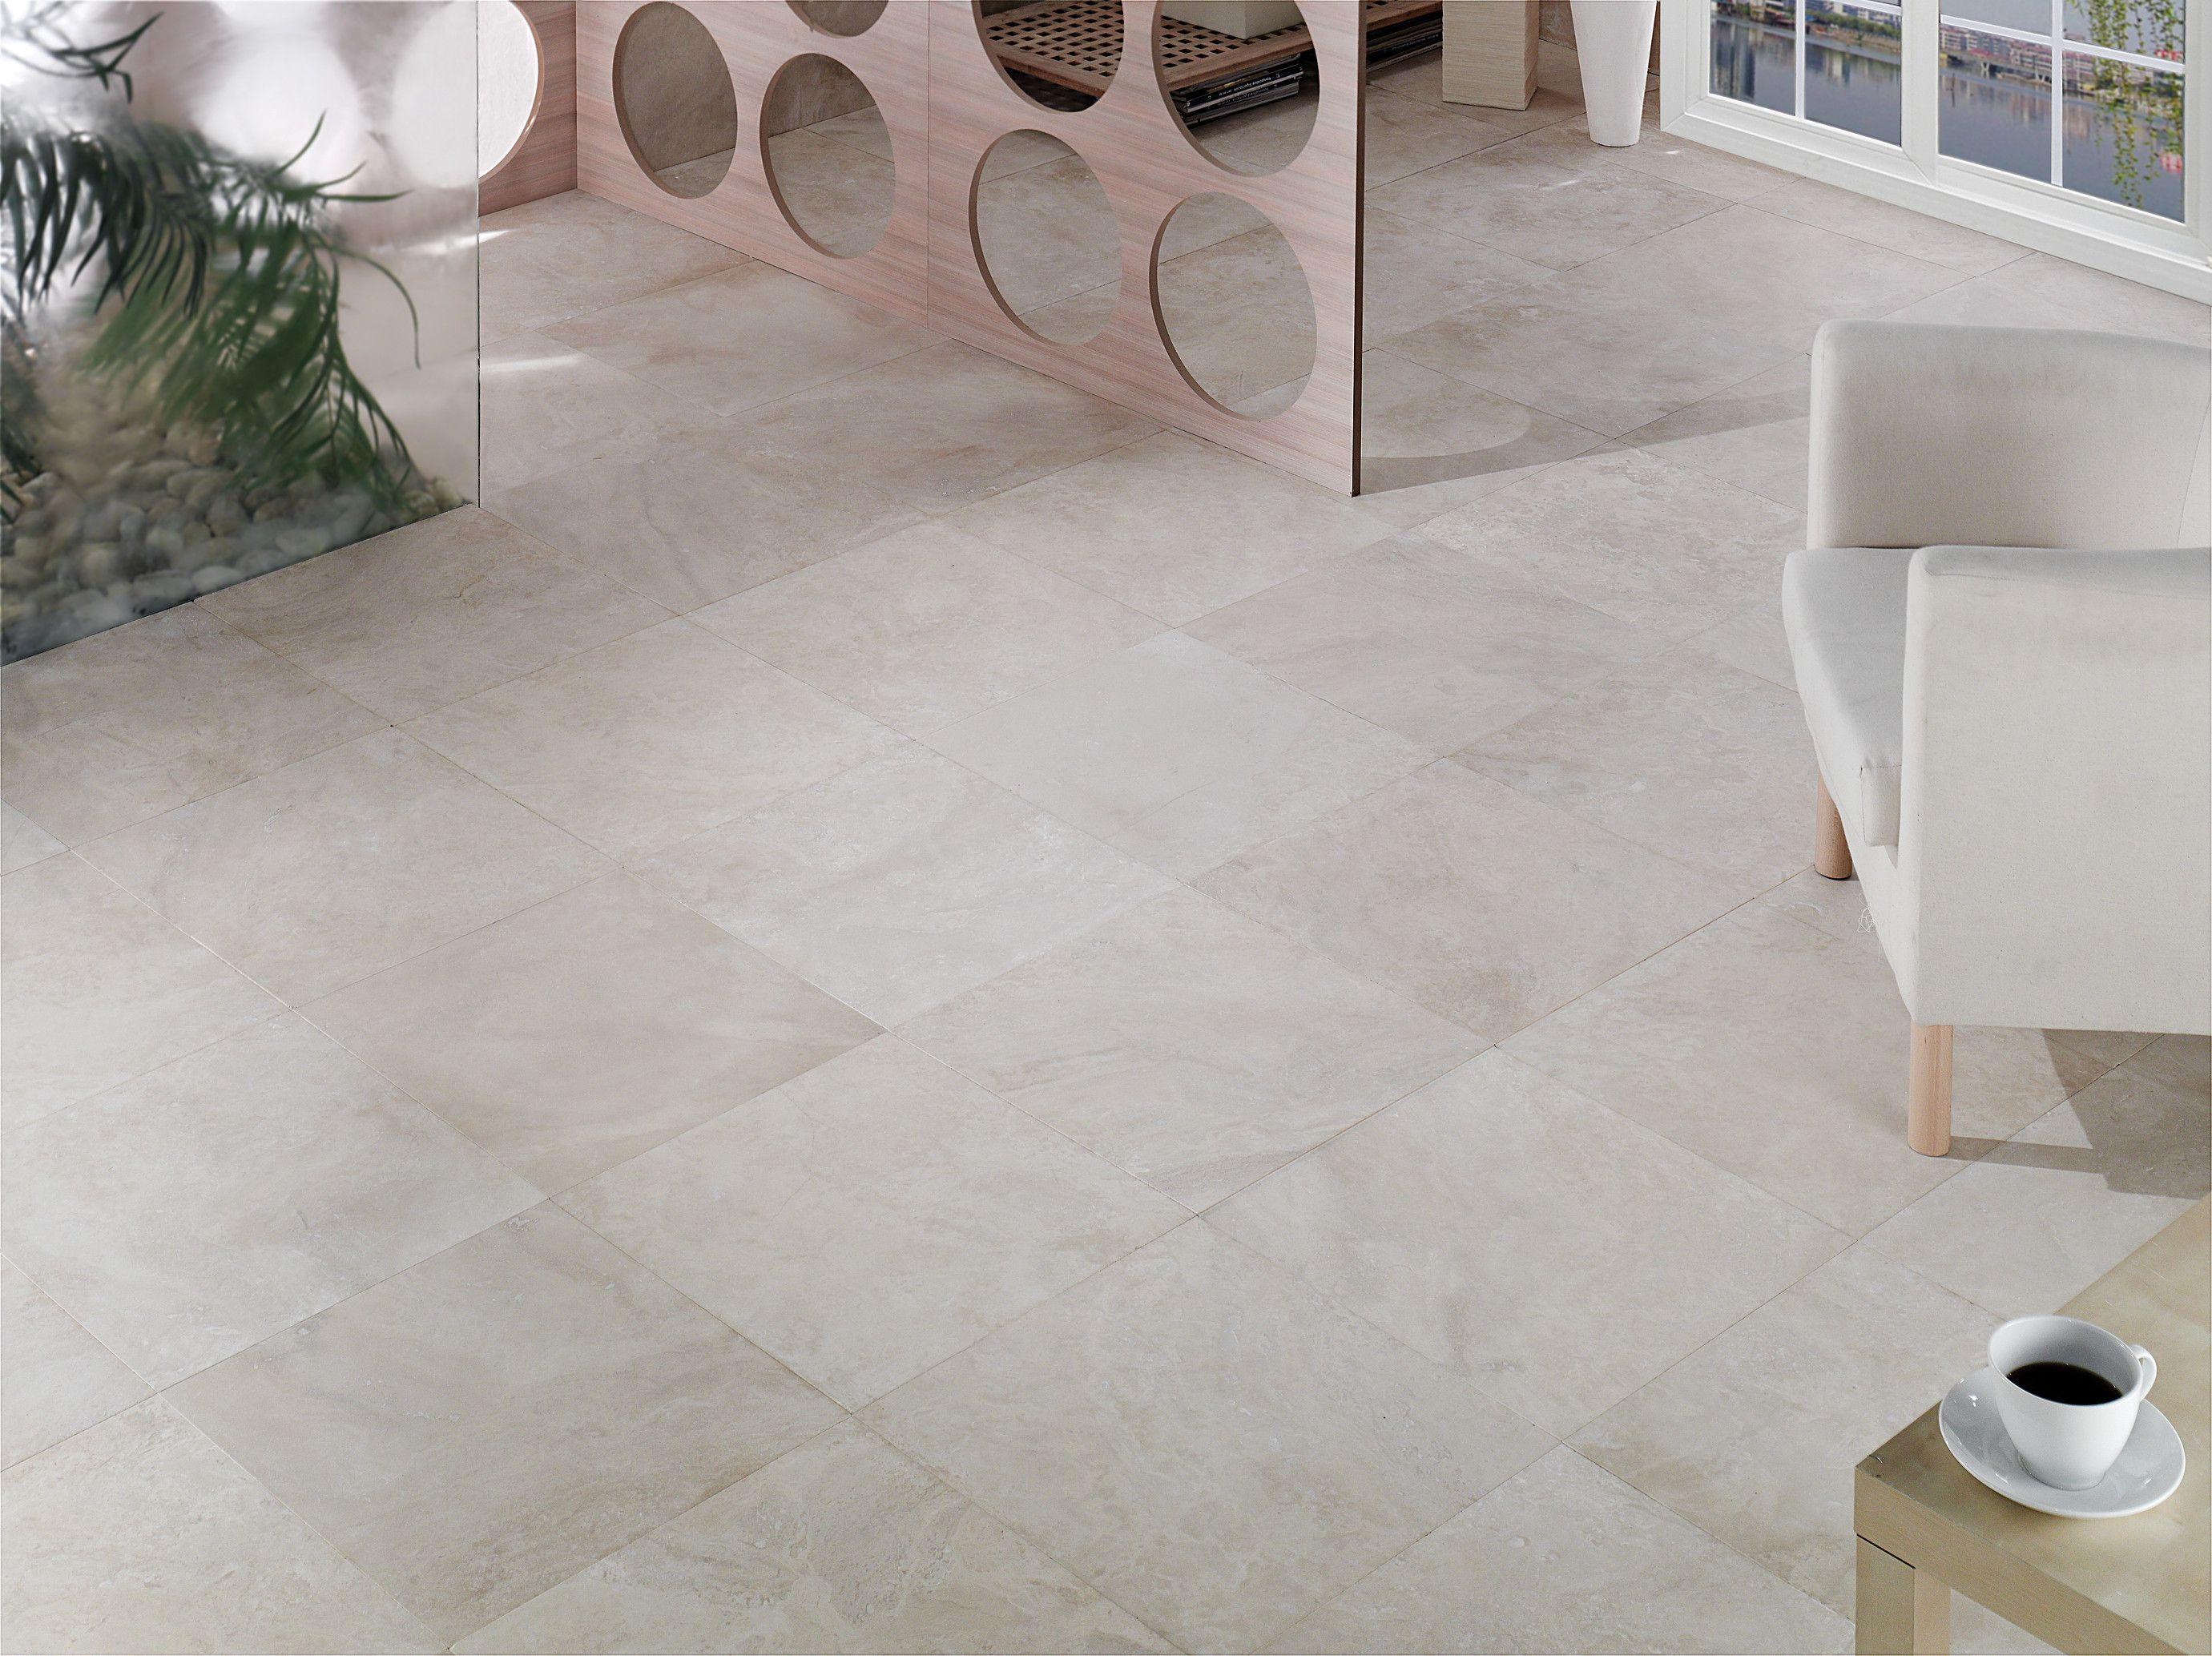 Houston travertine tile paver in houston project stone tile